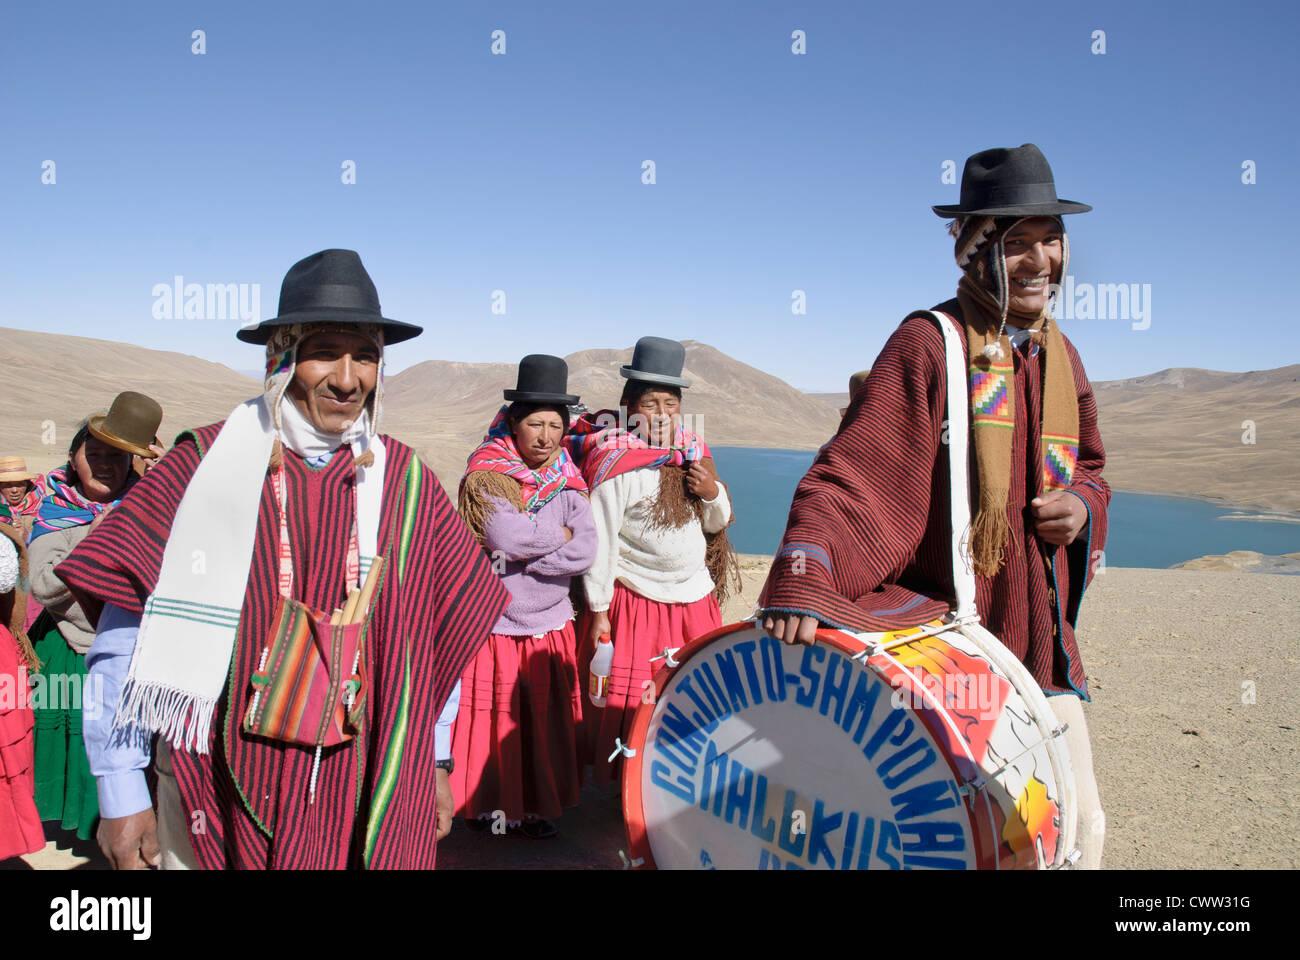 Musicians in the Cordillera of the Andes, Bolivia - Stock Image